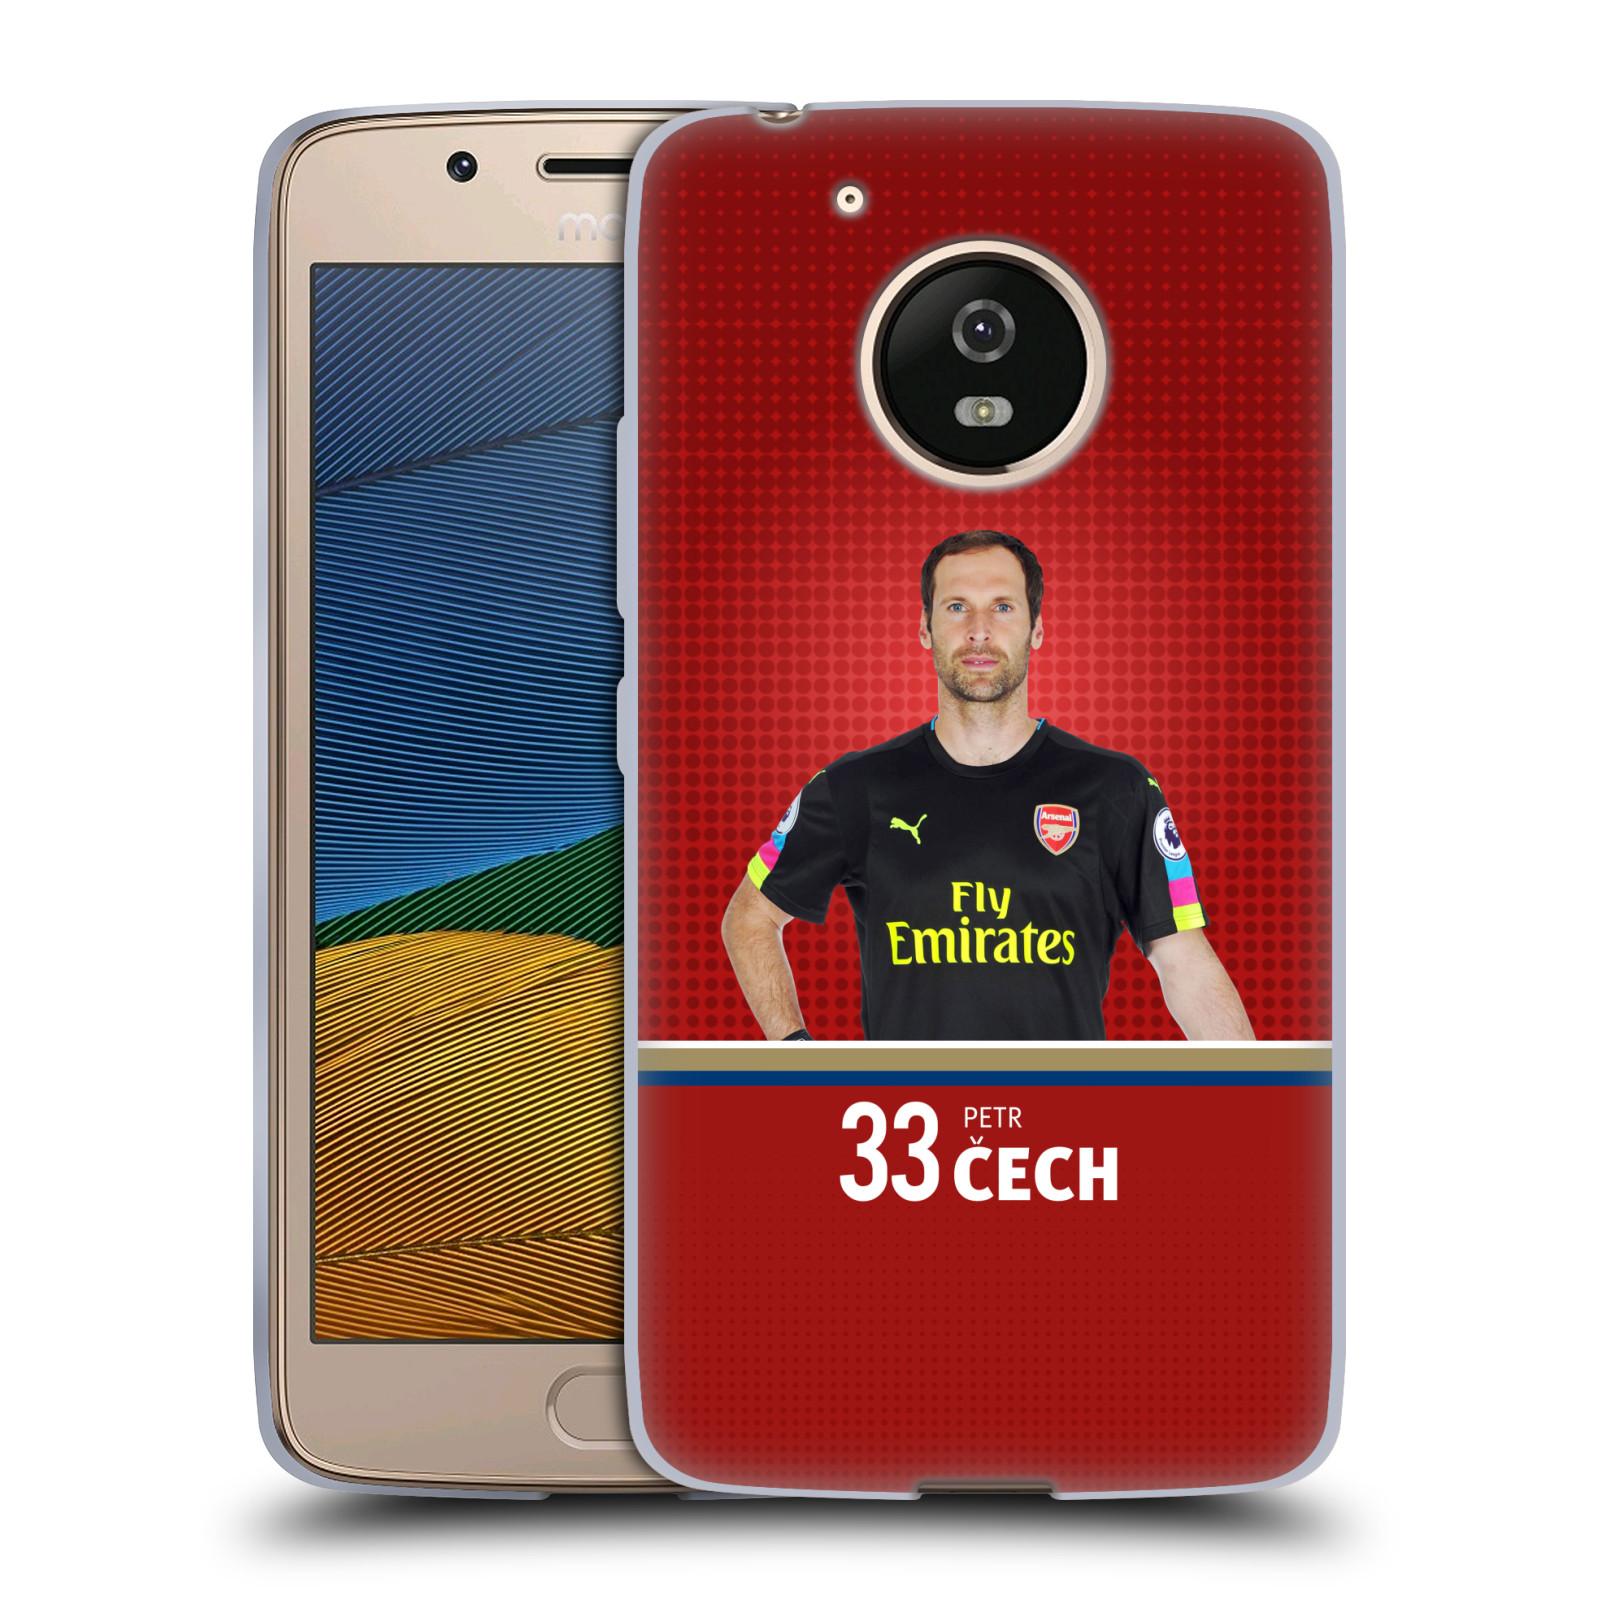 Silikonové pouzdro na mobil Lenovo Moto G5 - Head Case - Arsenal FC - Petr Čech